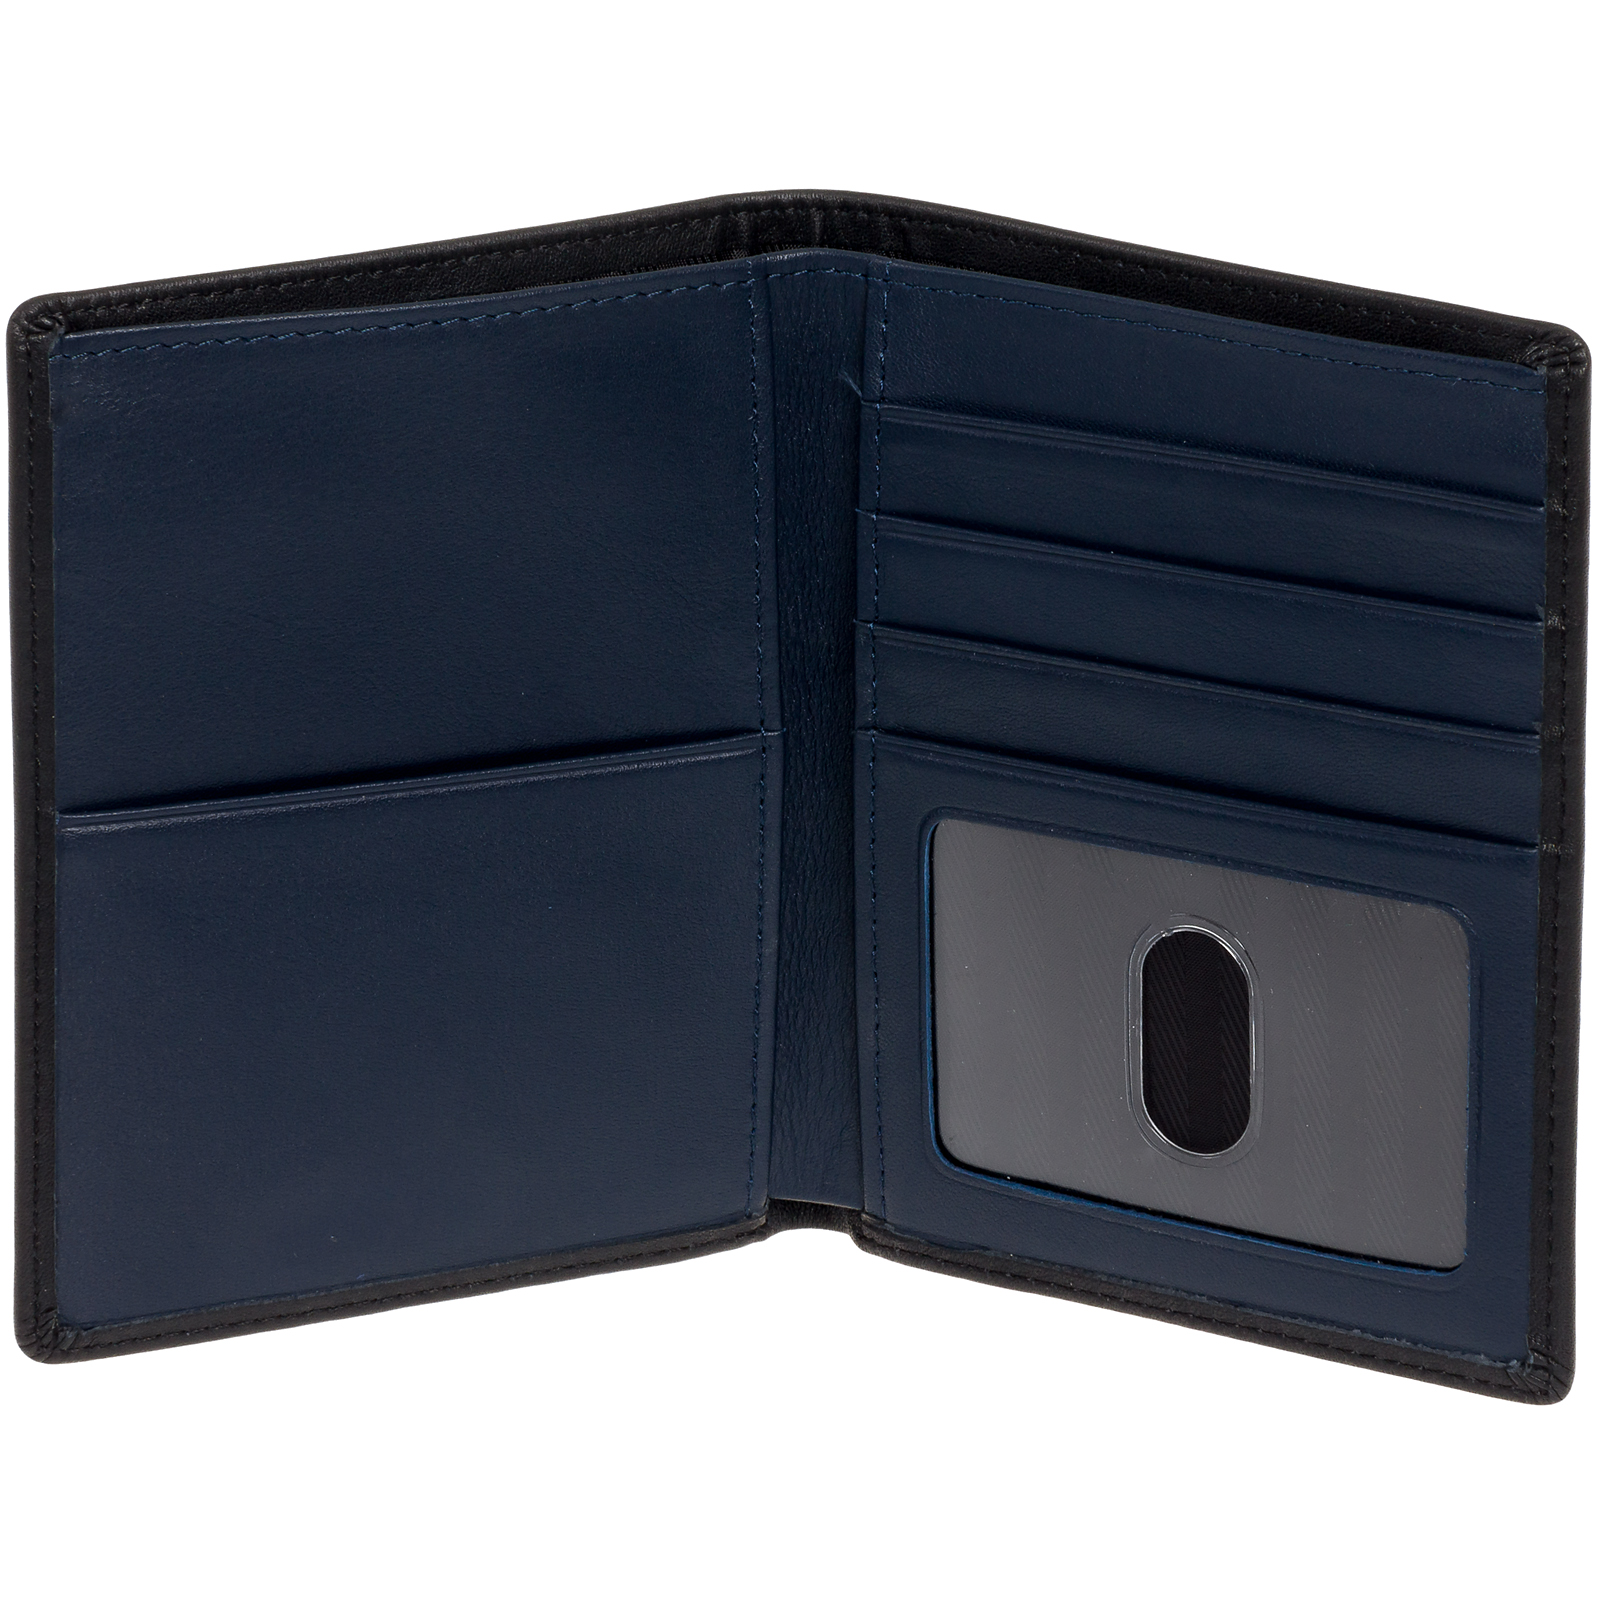 Osgoode Marley Mens Genuine Leather Rfid Passport Wallet Ebay